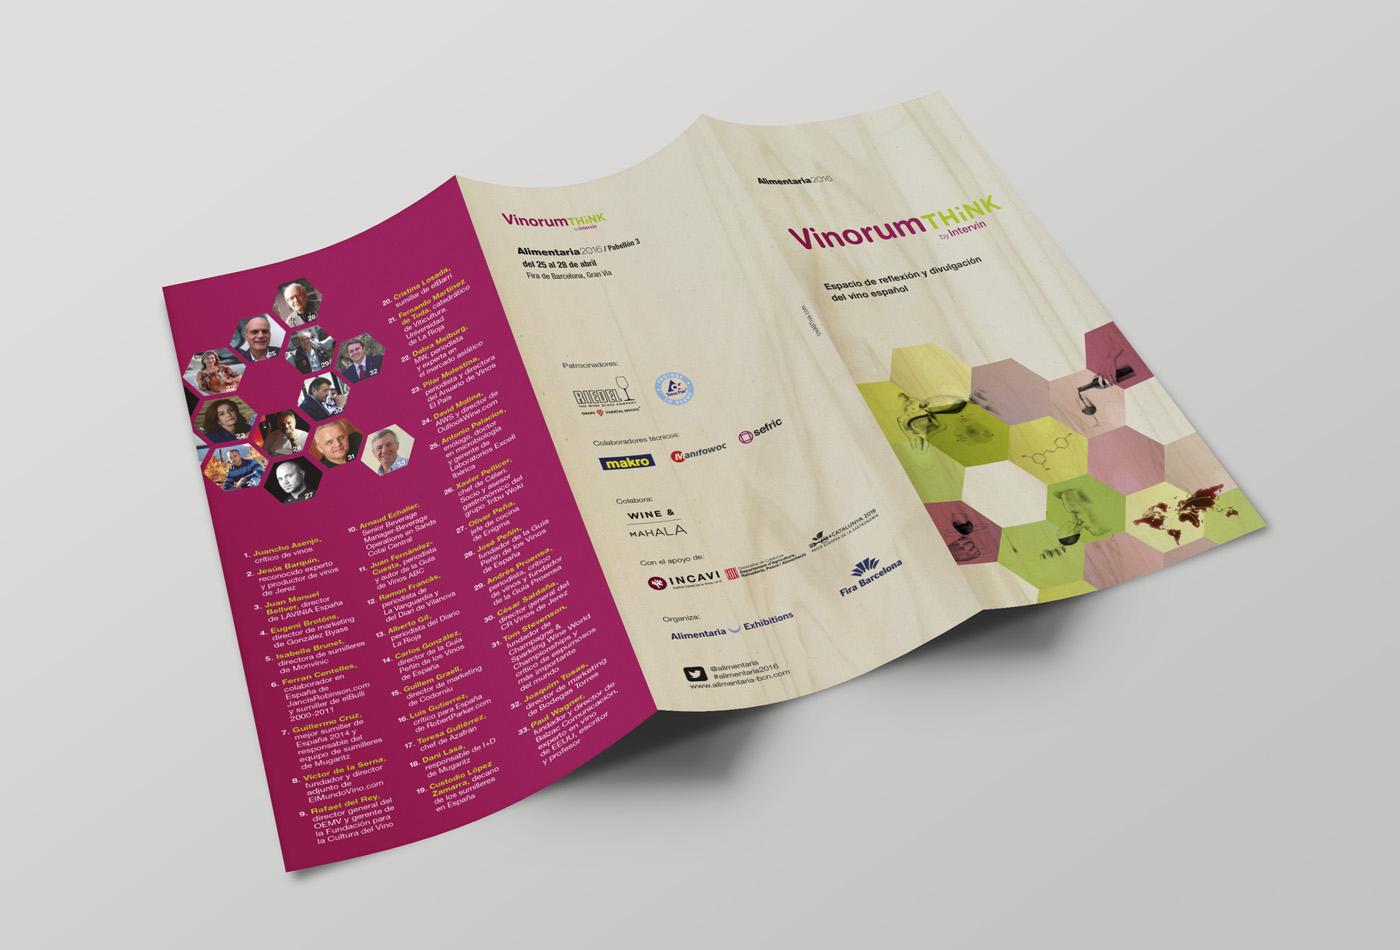 folleto-the-alimentaria-experience-2016-vinorum-think